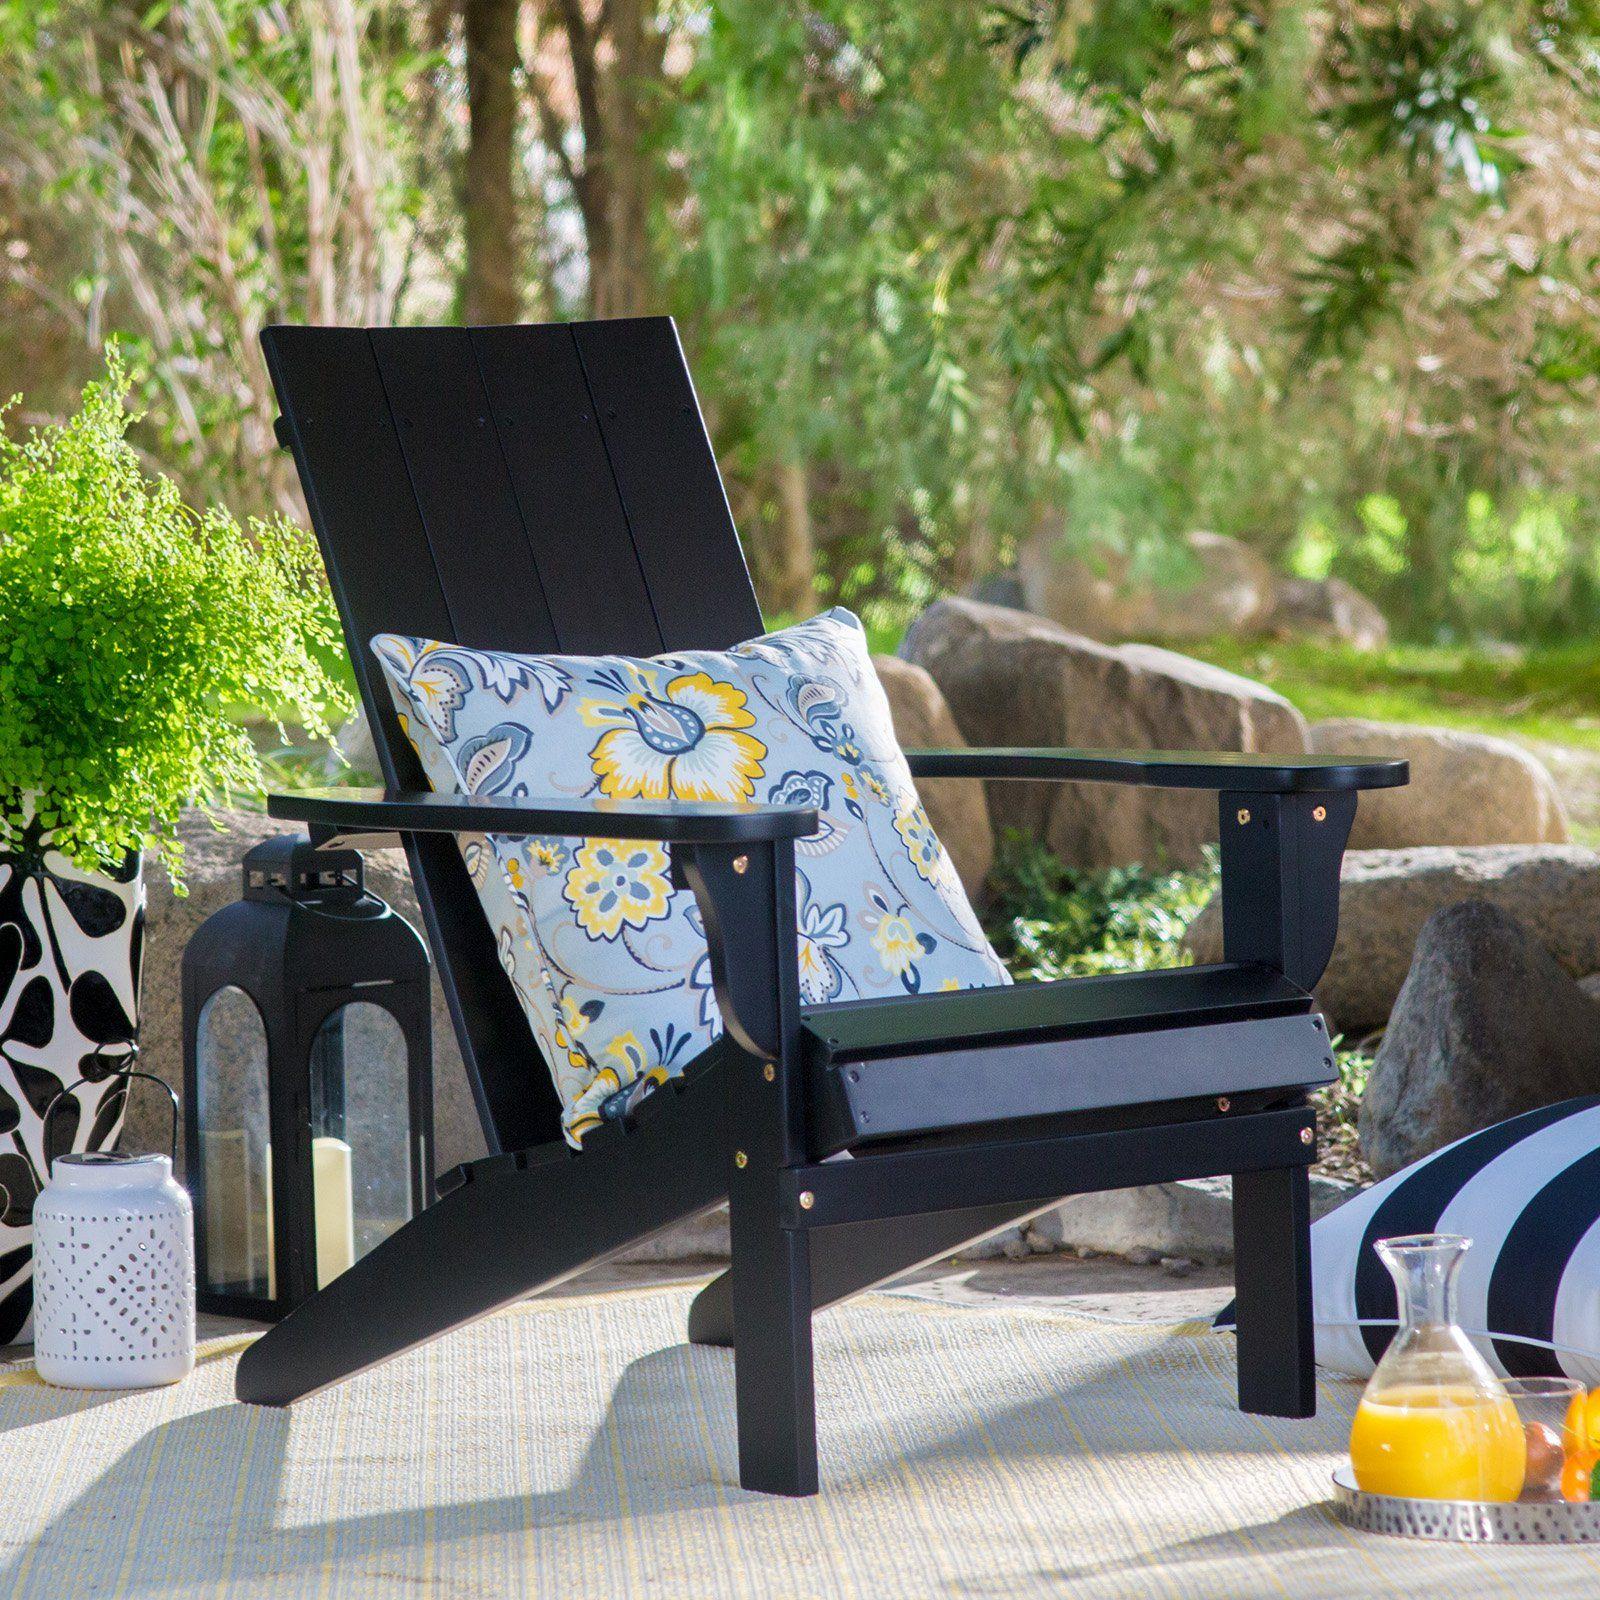 Outdoor Belham Living Portside Modern Adirondack Chair Black